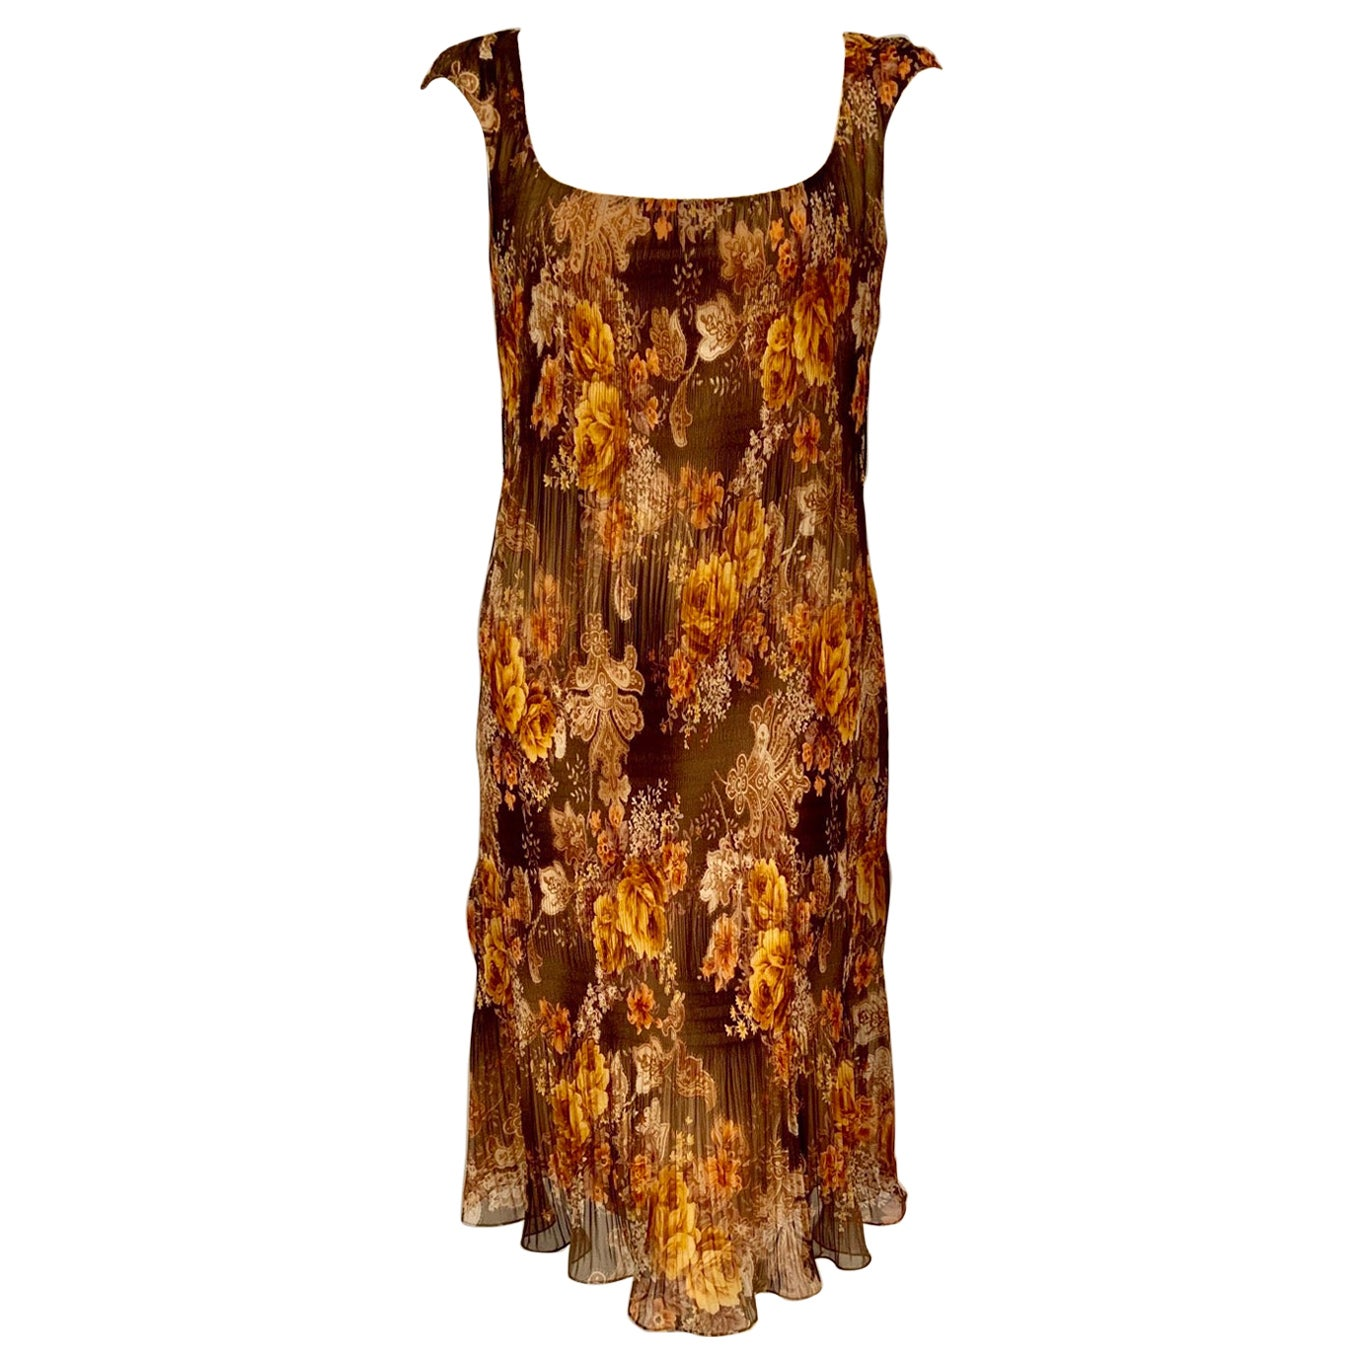 Richard Tyler Couture Autumn Floral Printed Silk Chiffon Dress